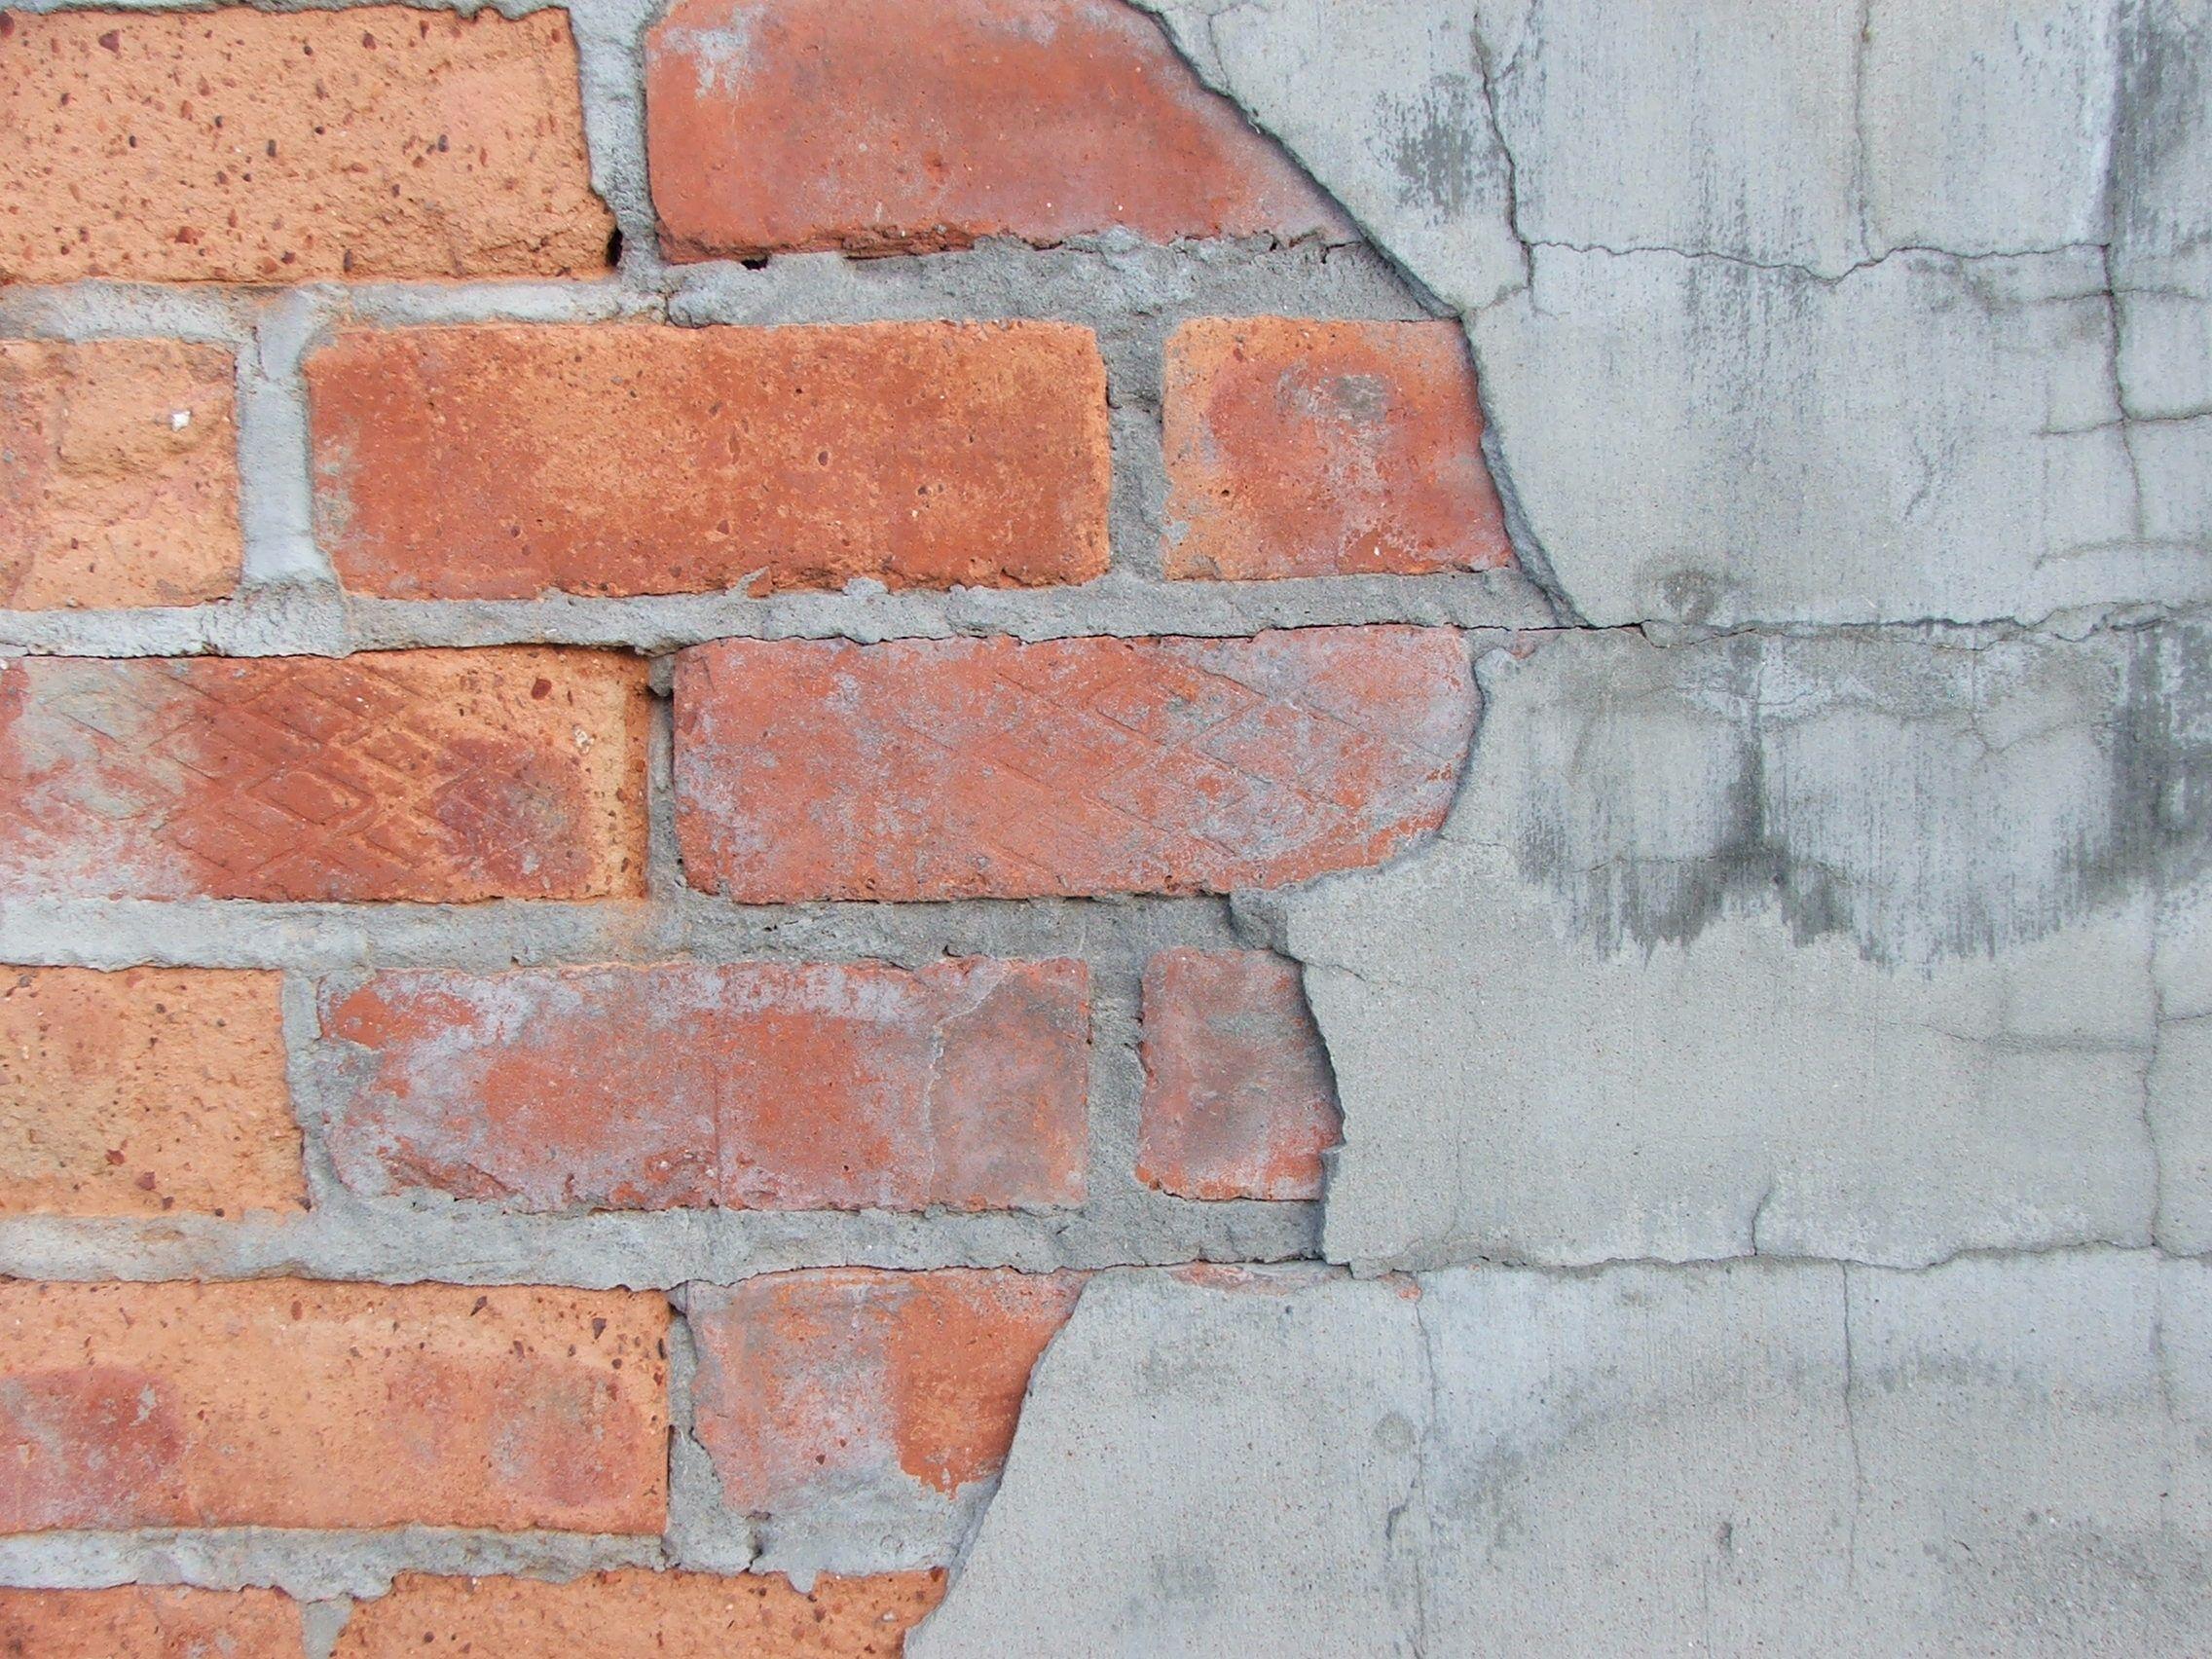 Peeling Plaster Faux Brick Walls Brick Show Faux Walls